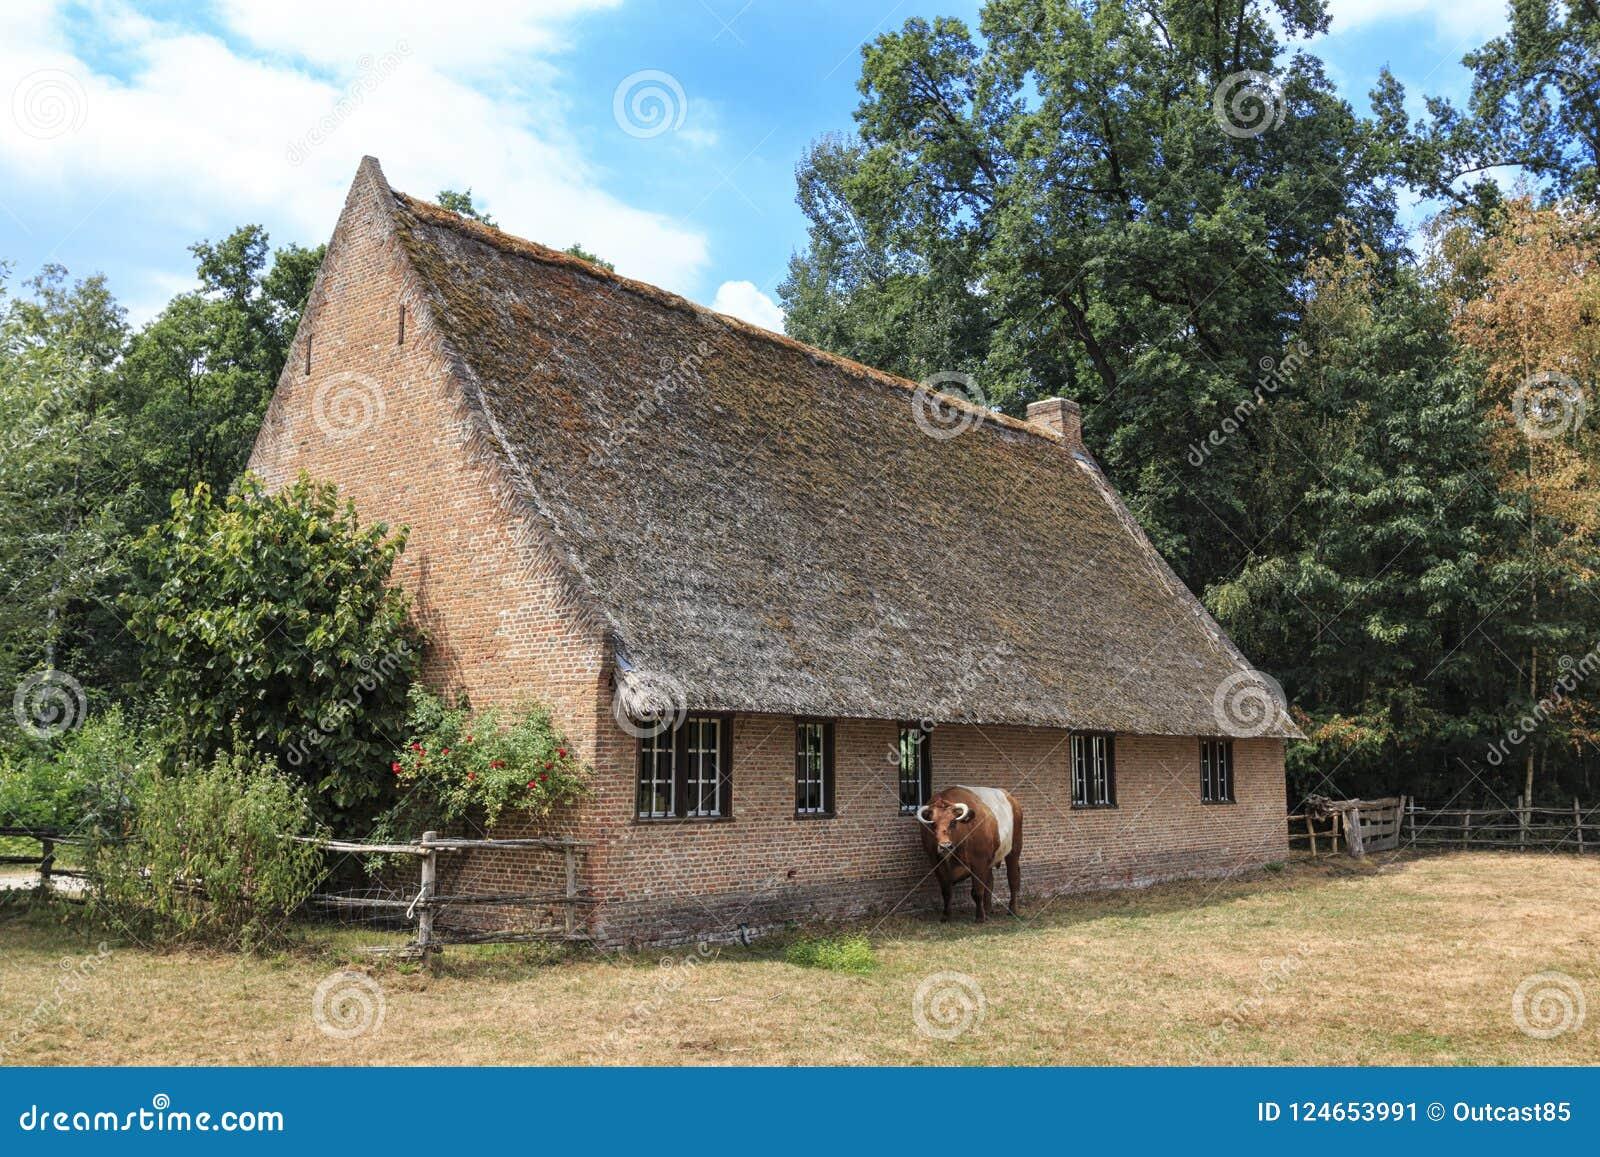 Belgian Farmhouse Photos Free Royalty Free Stock Photos From Dreamstime